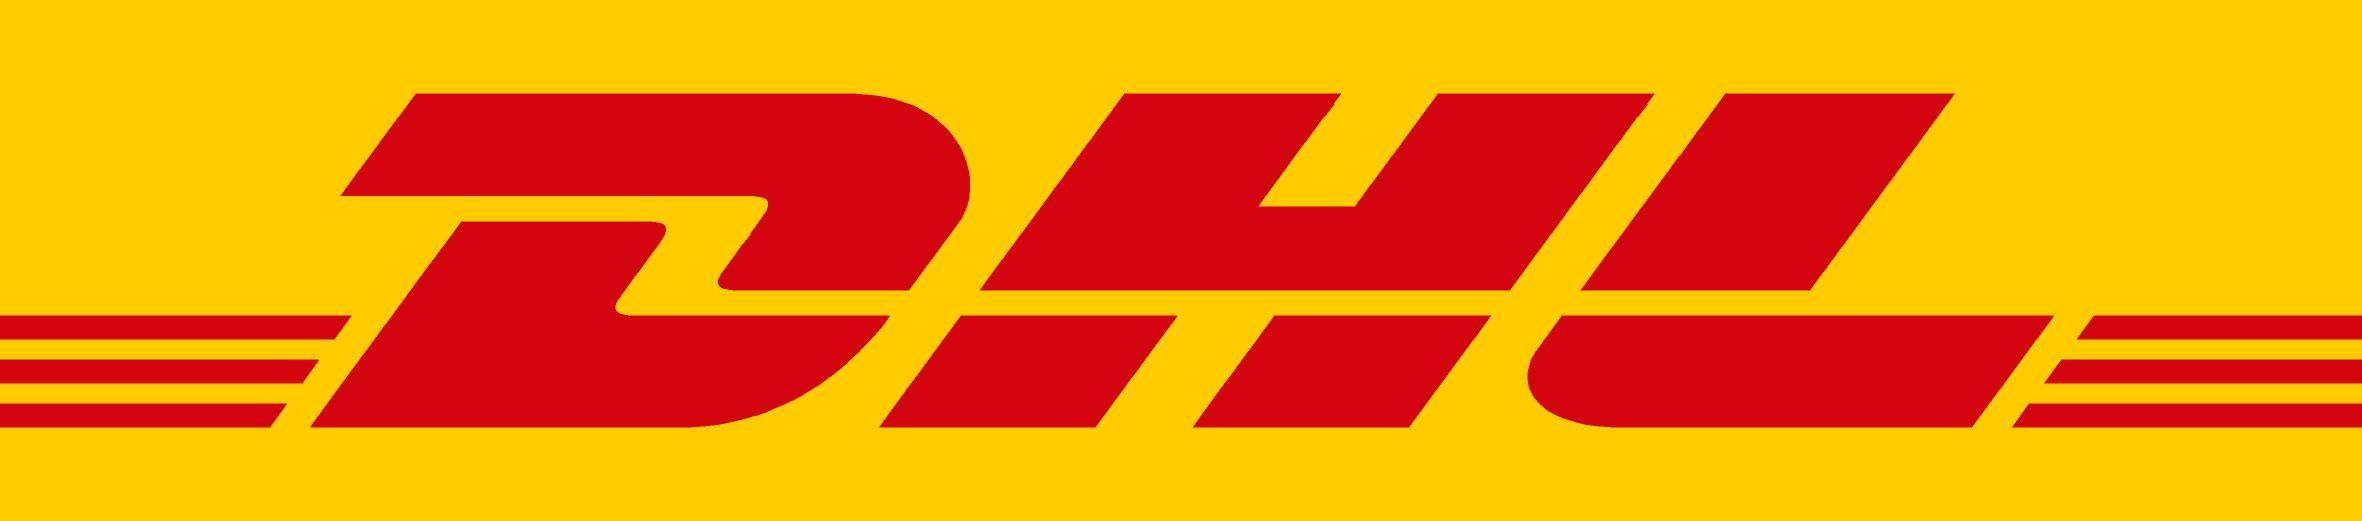 DHL Global Supply Chain logo